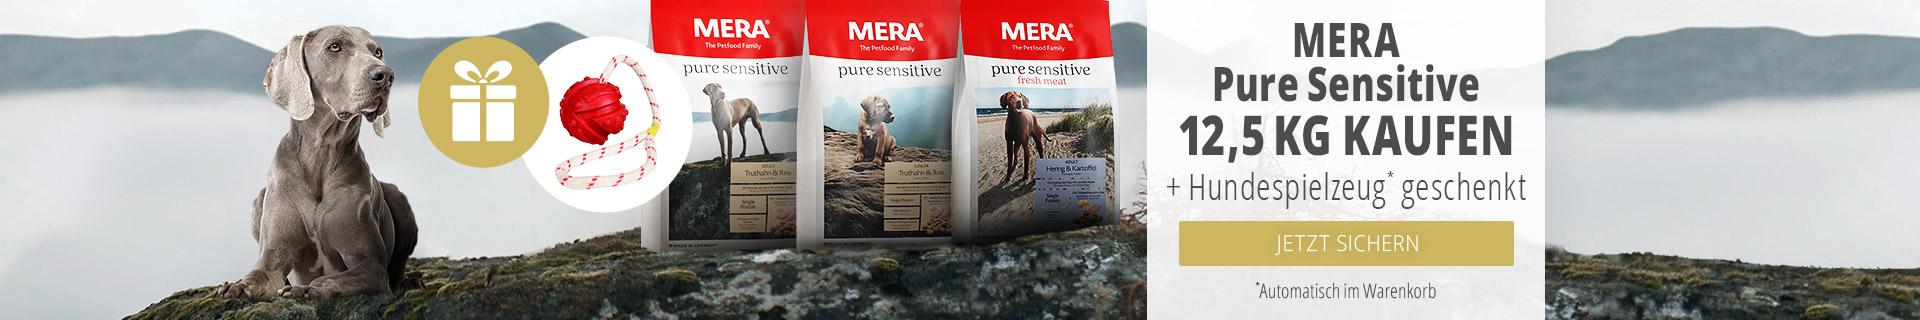 Mera Pure Sensitive Aktion 12,5kg bestellen + Hundespielzeug gratis